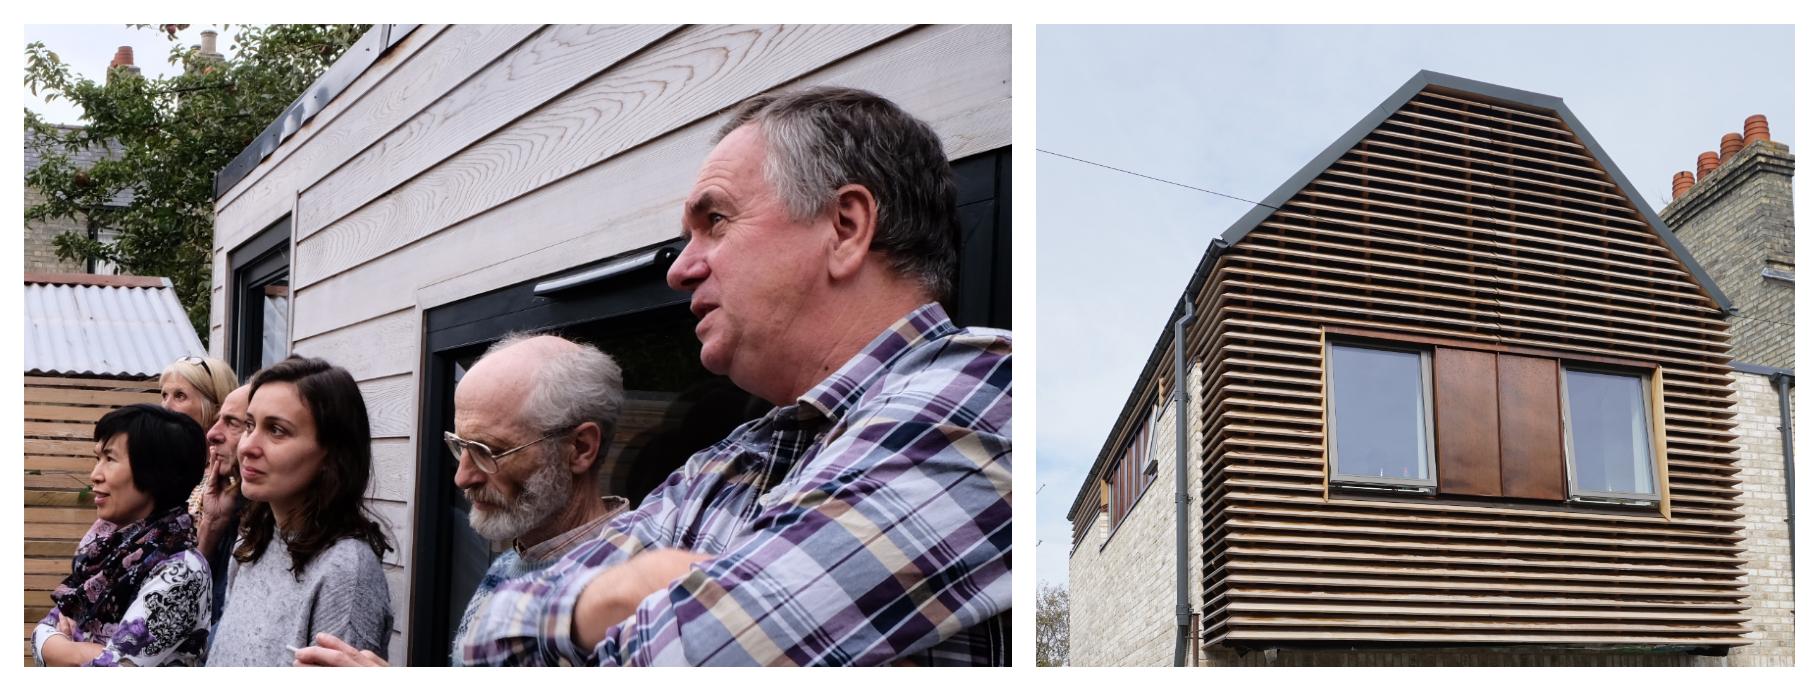 Online tour of Mark Brinkley's Self-Build Home